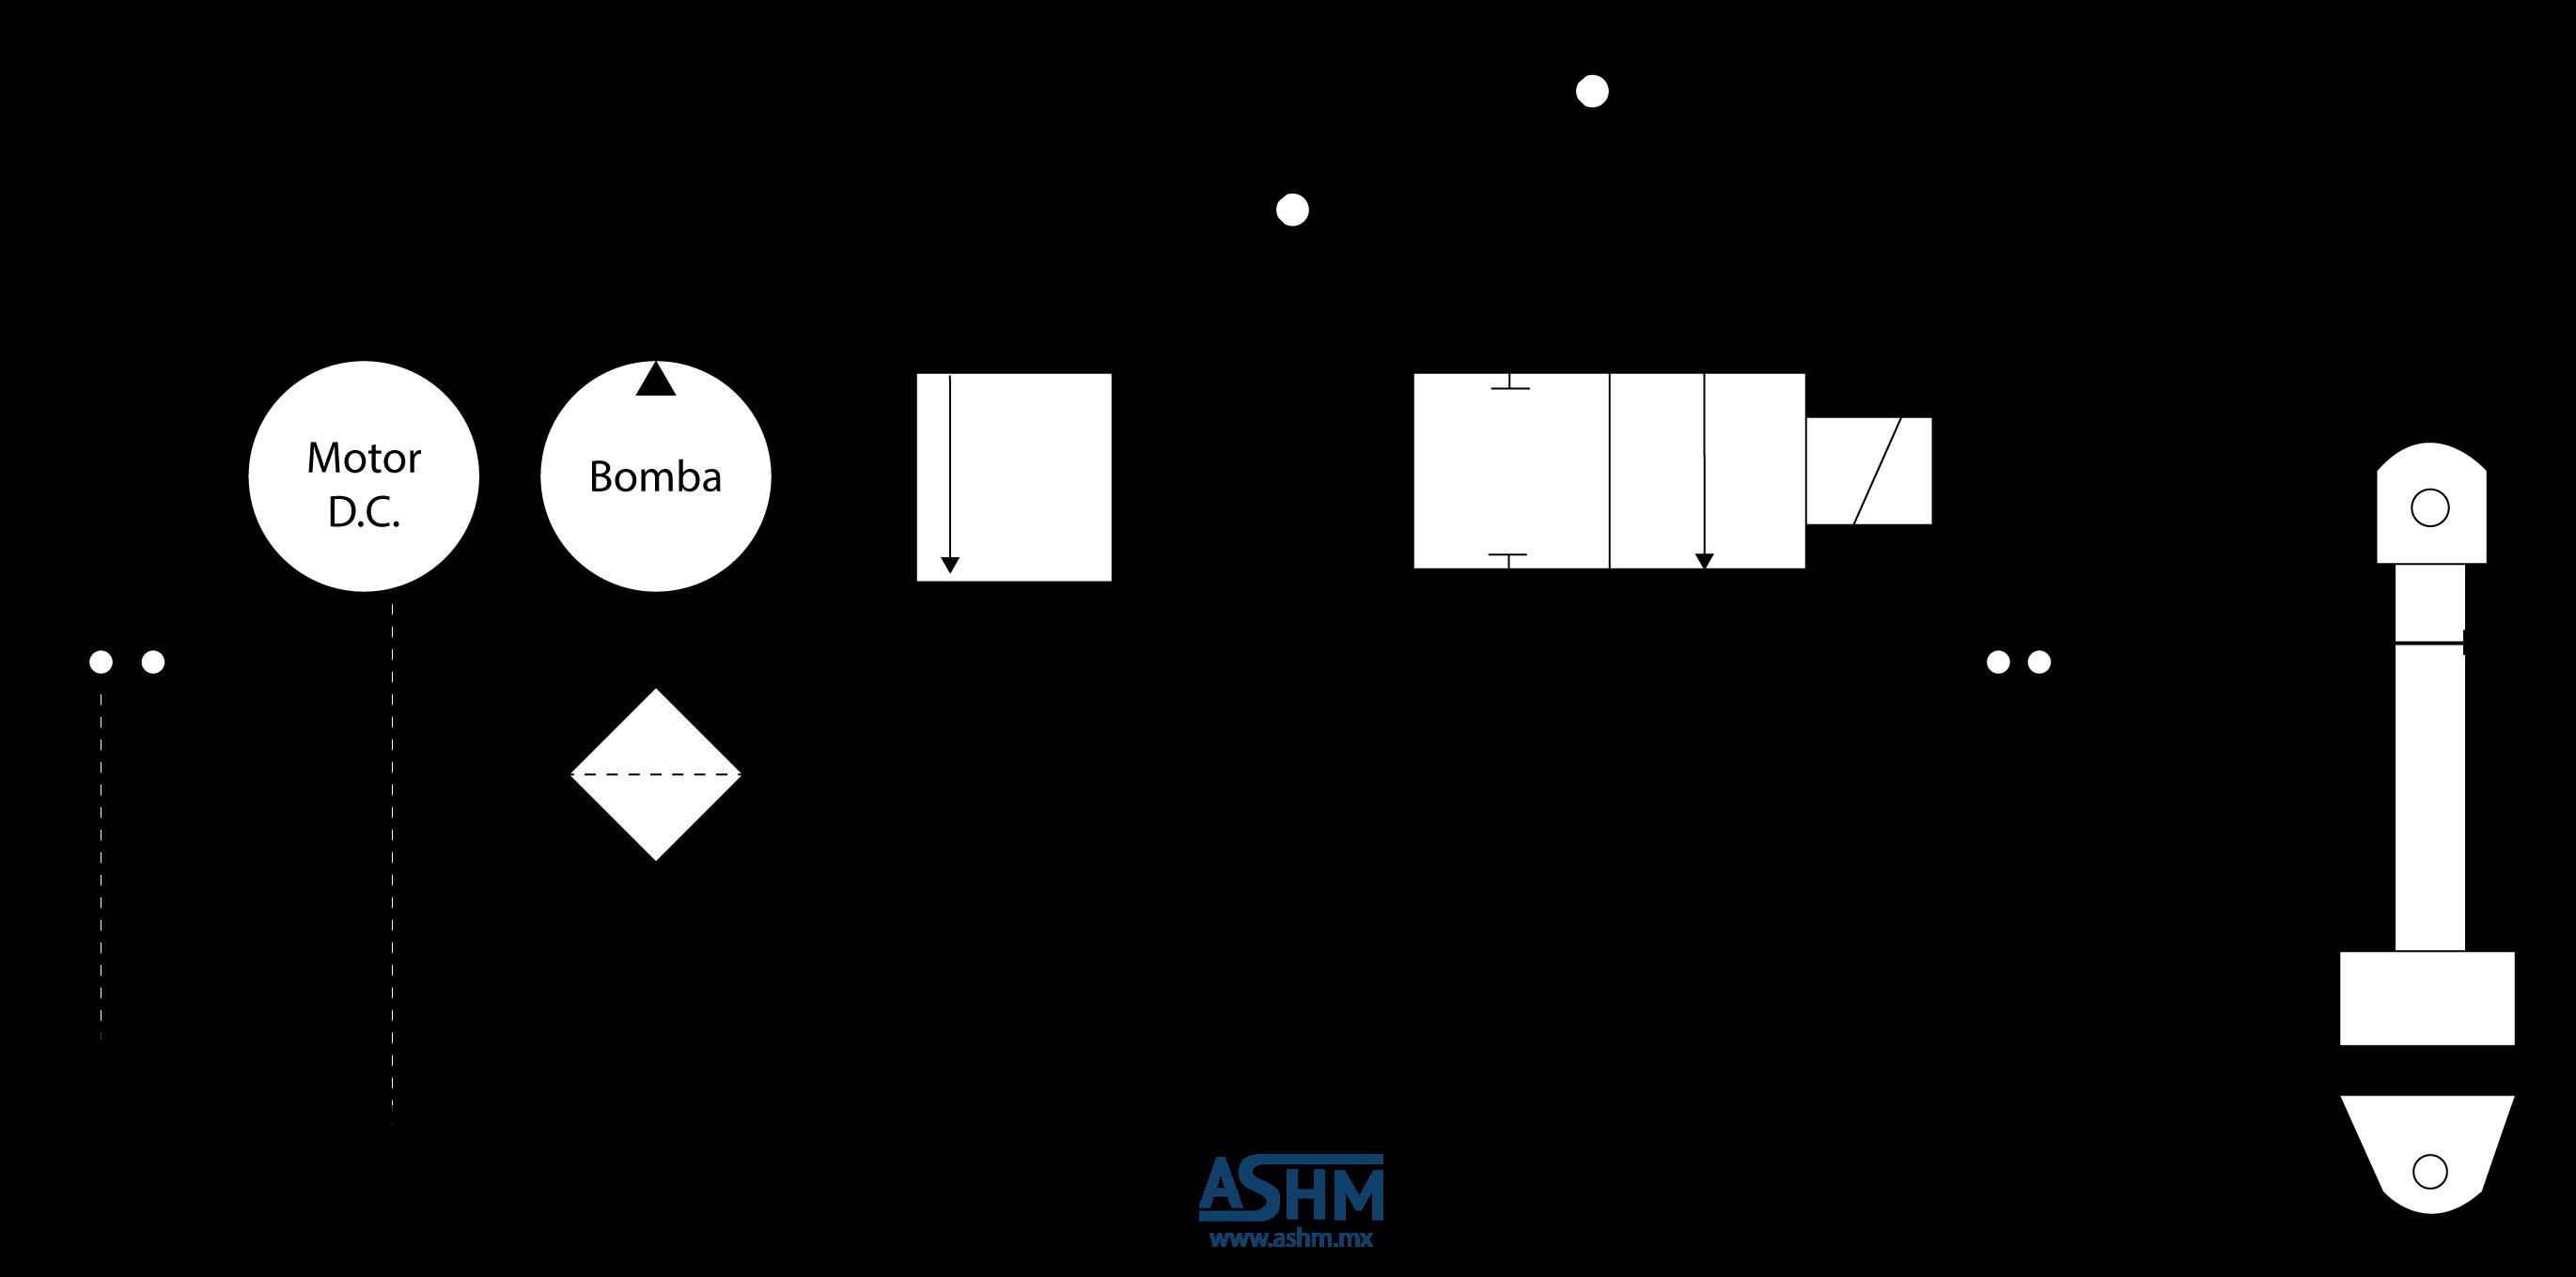 Circuito Hidraulico Basico : Simbologia sistema hidraulico basico mantenimiento de